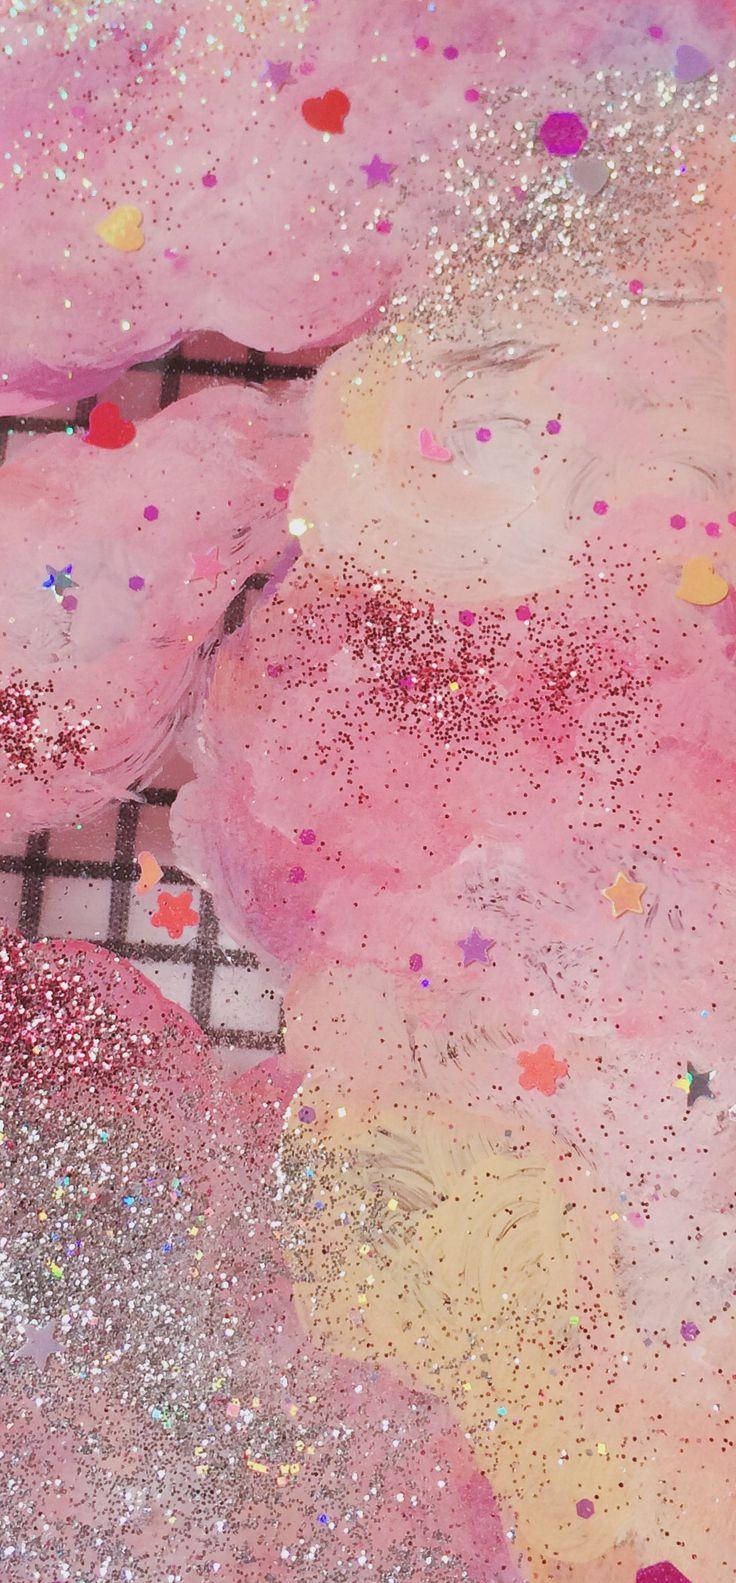 Pink Confetti and Glitter Texture